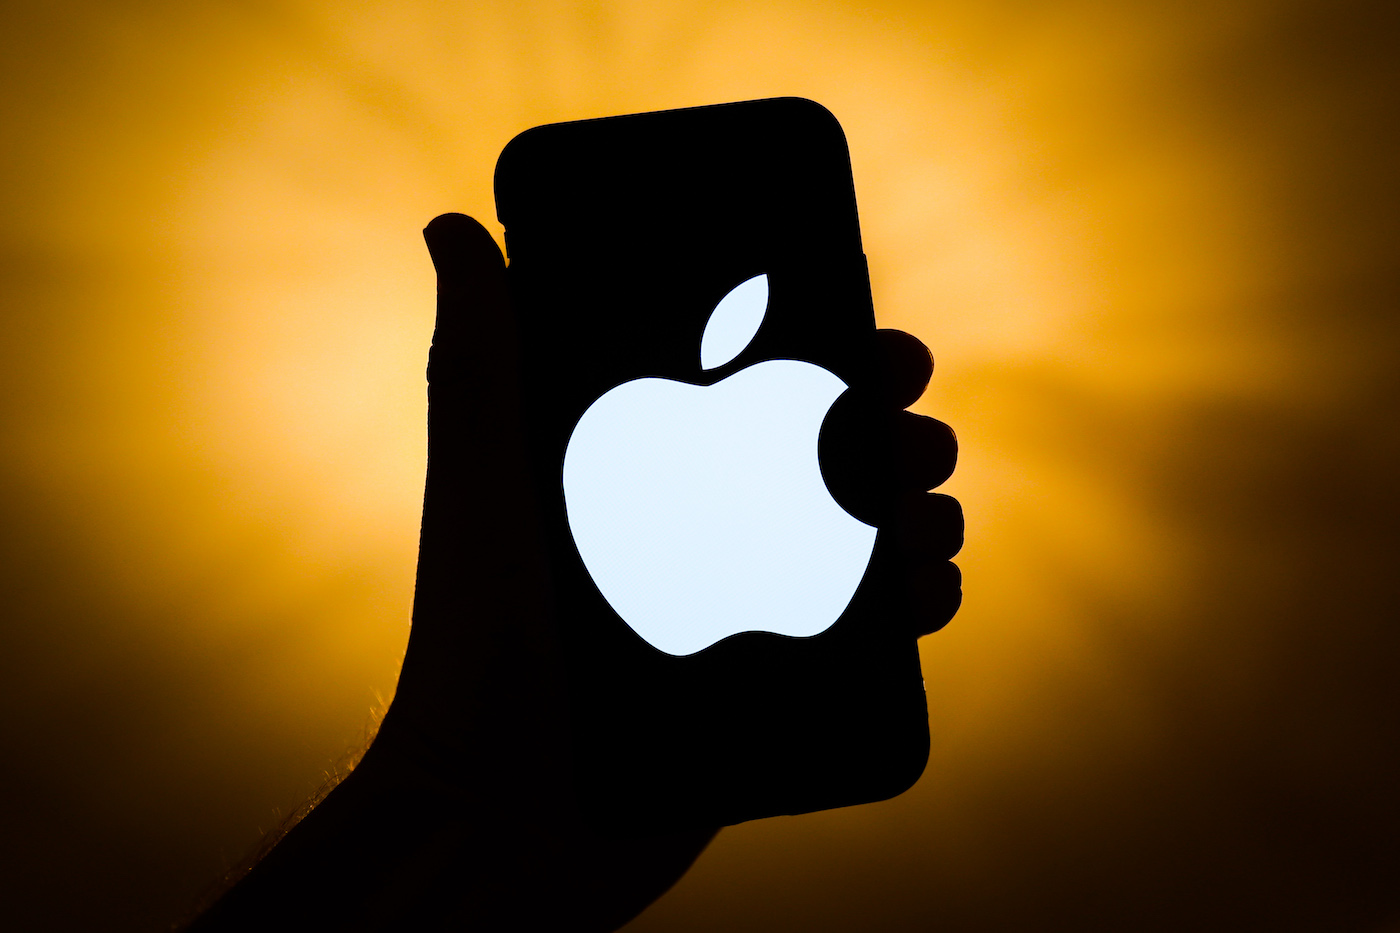 Apple logo is seen displayed on a phone screen in this illustration photo taken in Krakow, Poland on September 21, 2021. (Photo Illustration by Jakub Porzycki/NurPhoto via Getty Images)